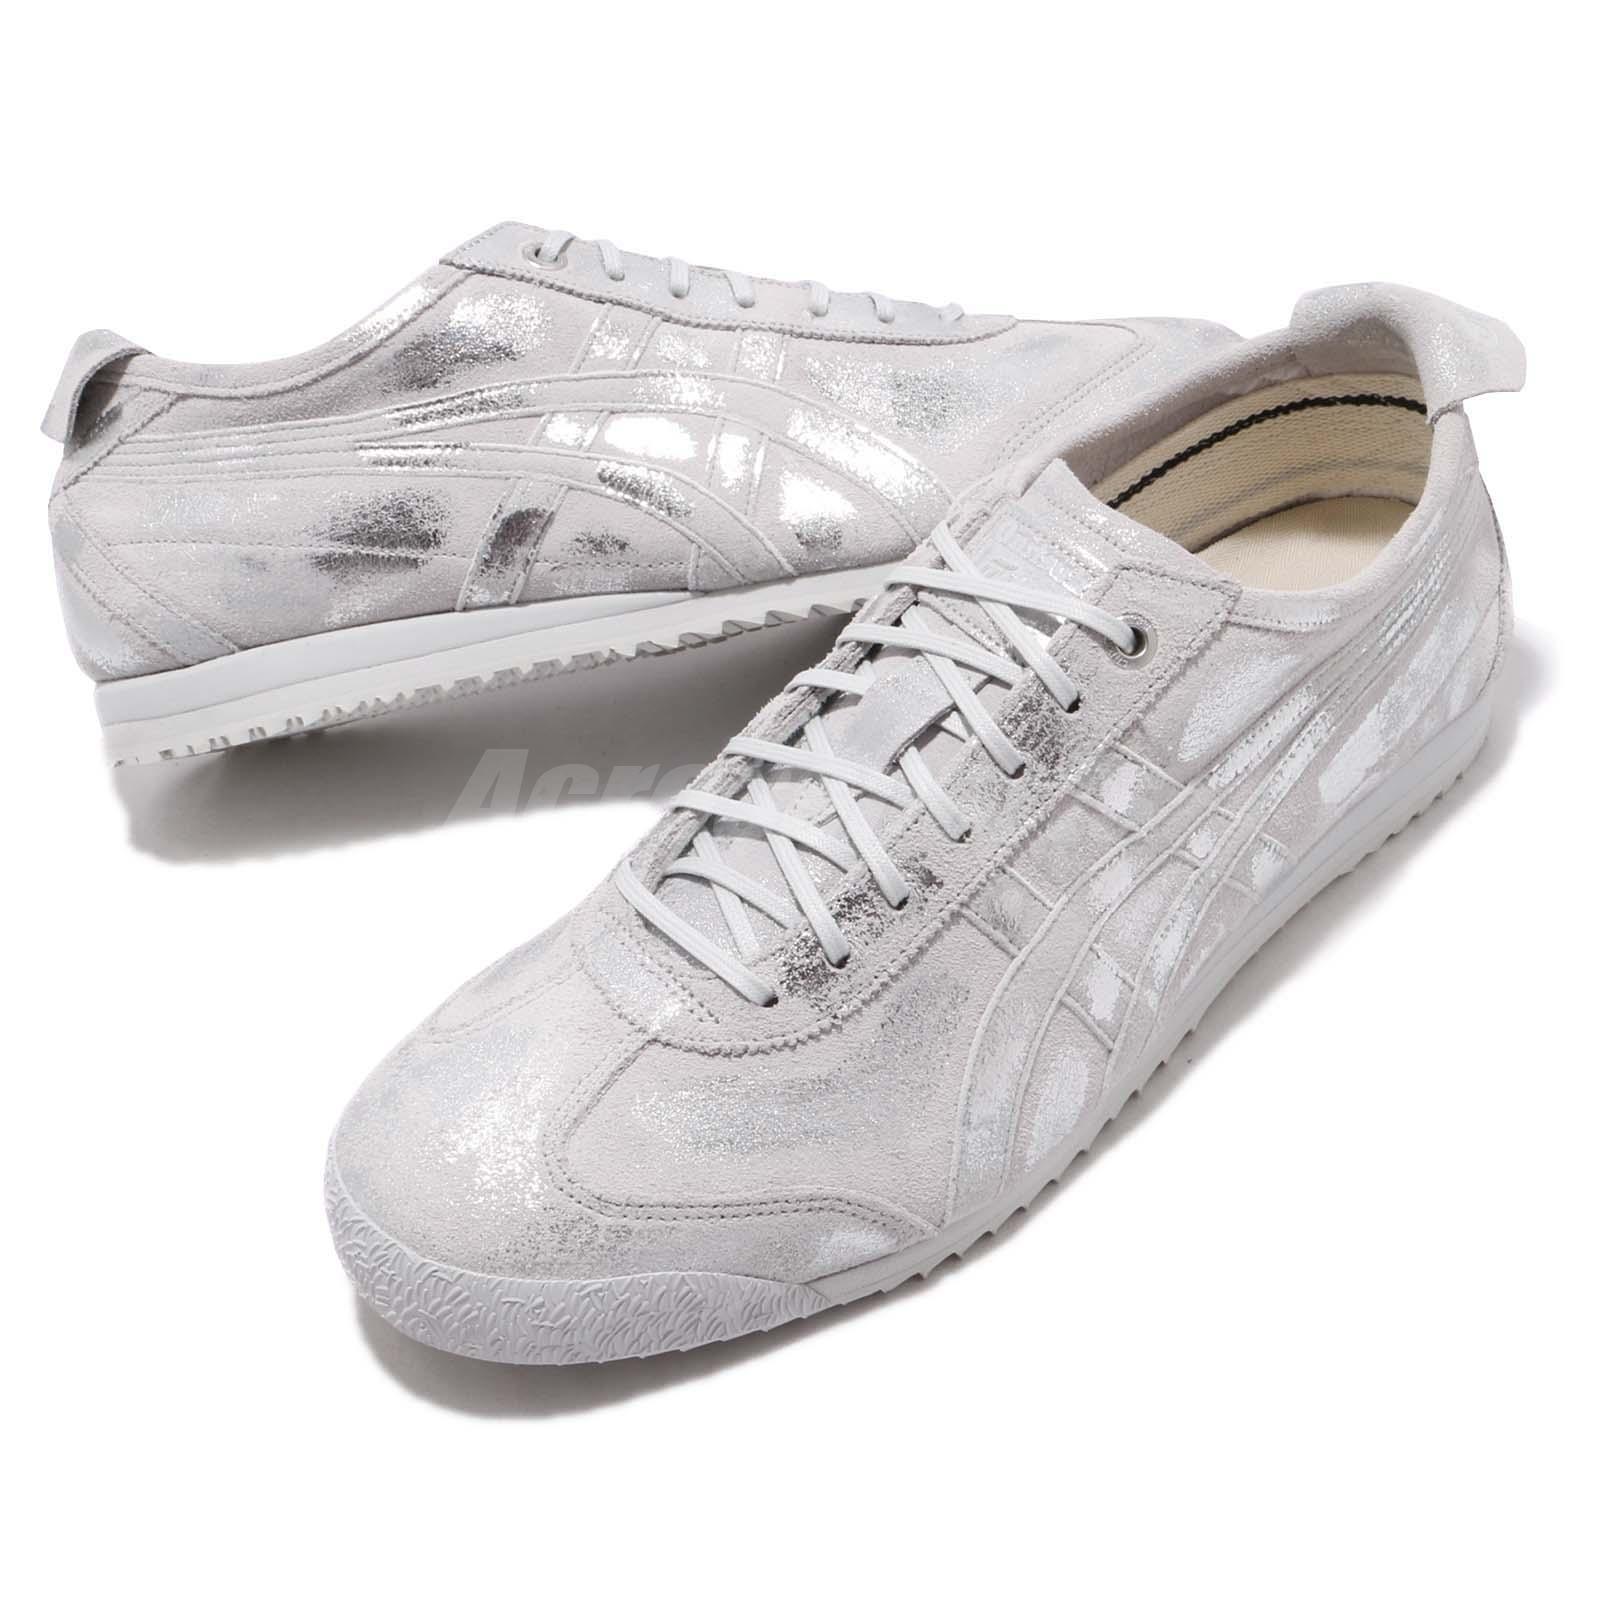 b0c2b011c97ac Details about Asics Onitsuka Tiger Mexico 66 Glacier Grey Silver Men Women  Shoes 1183A190-020